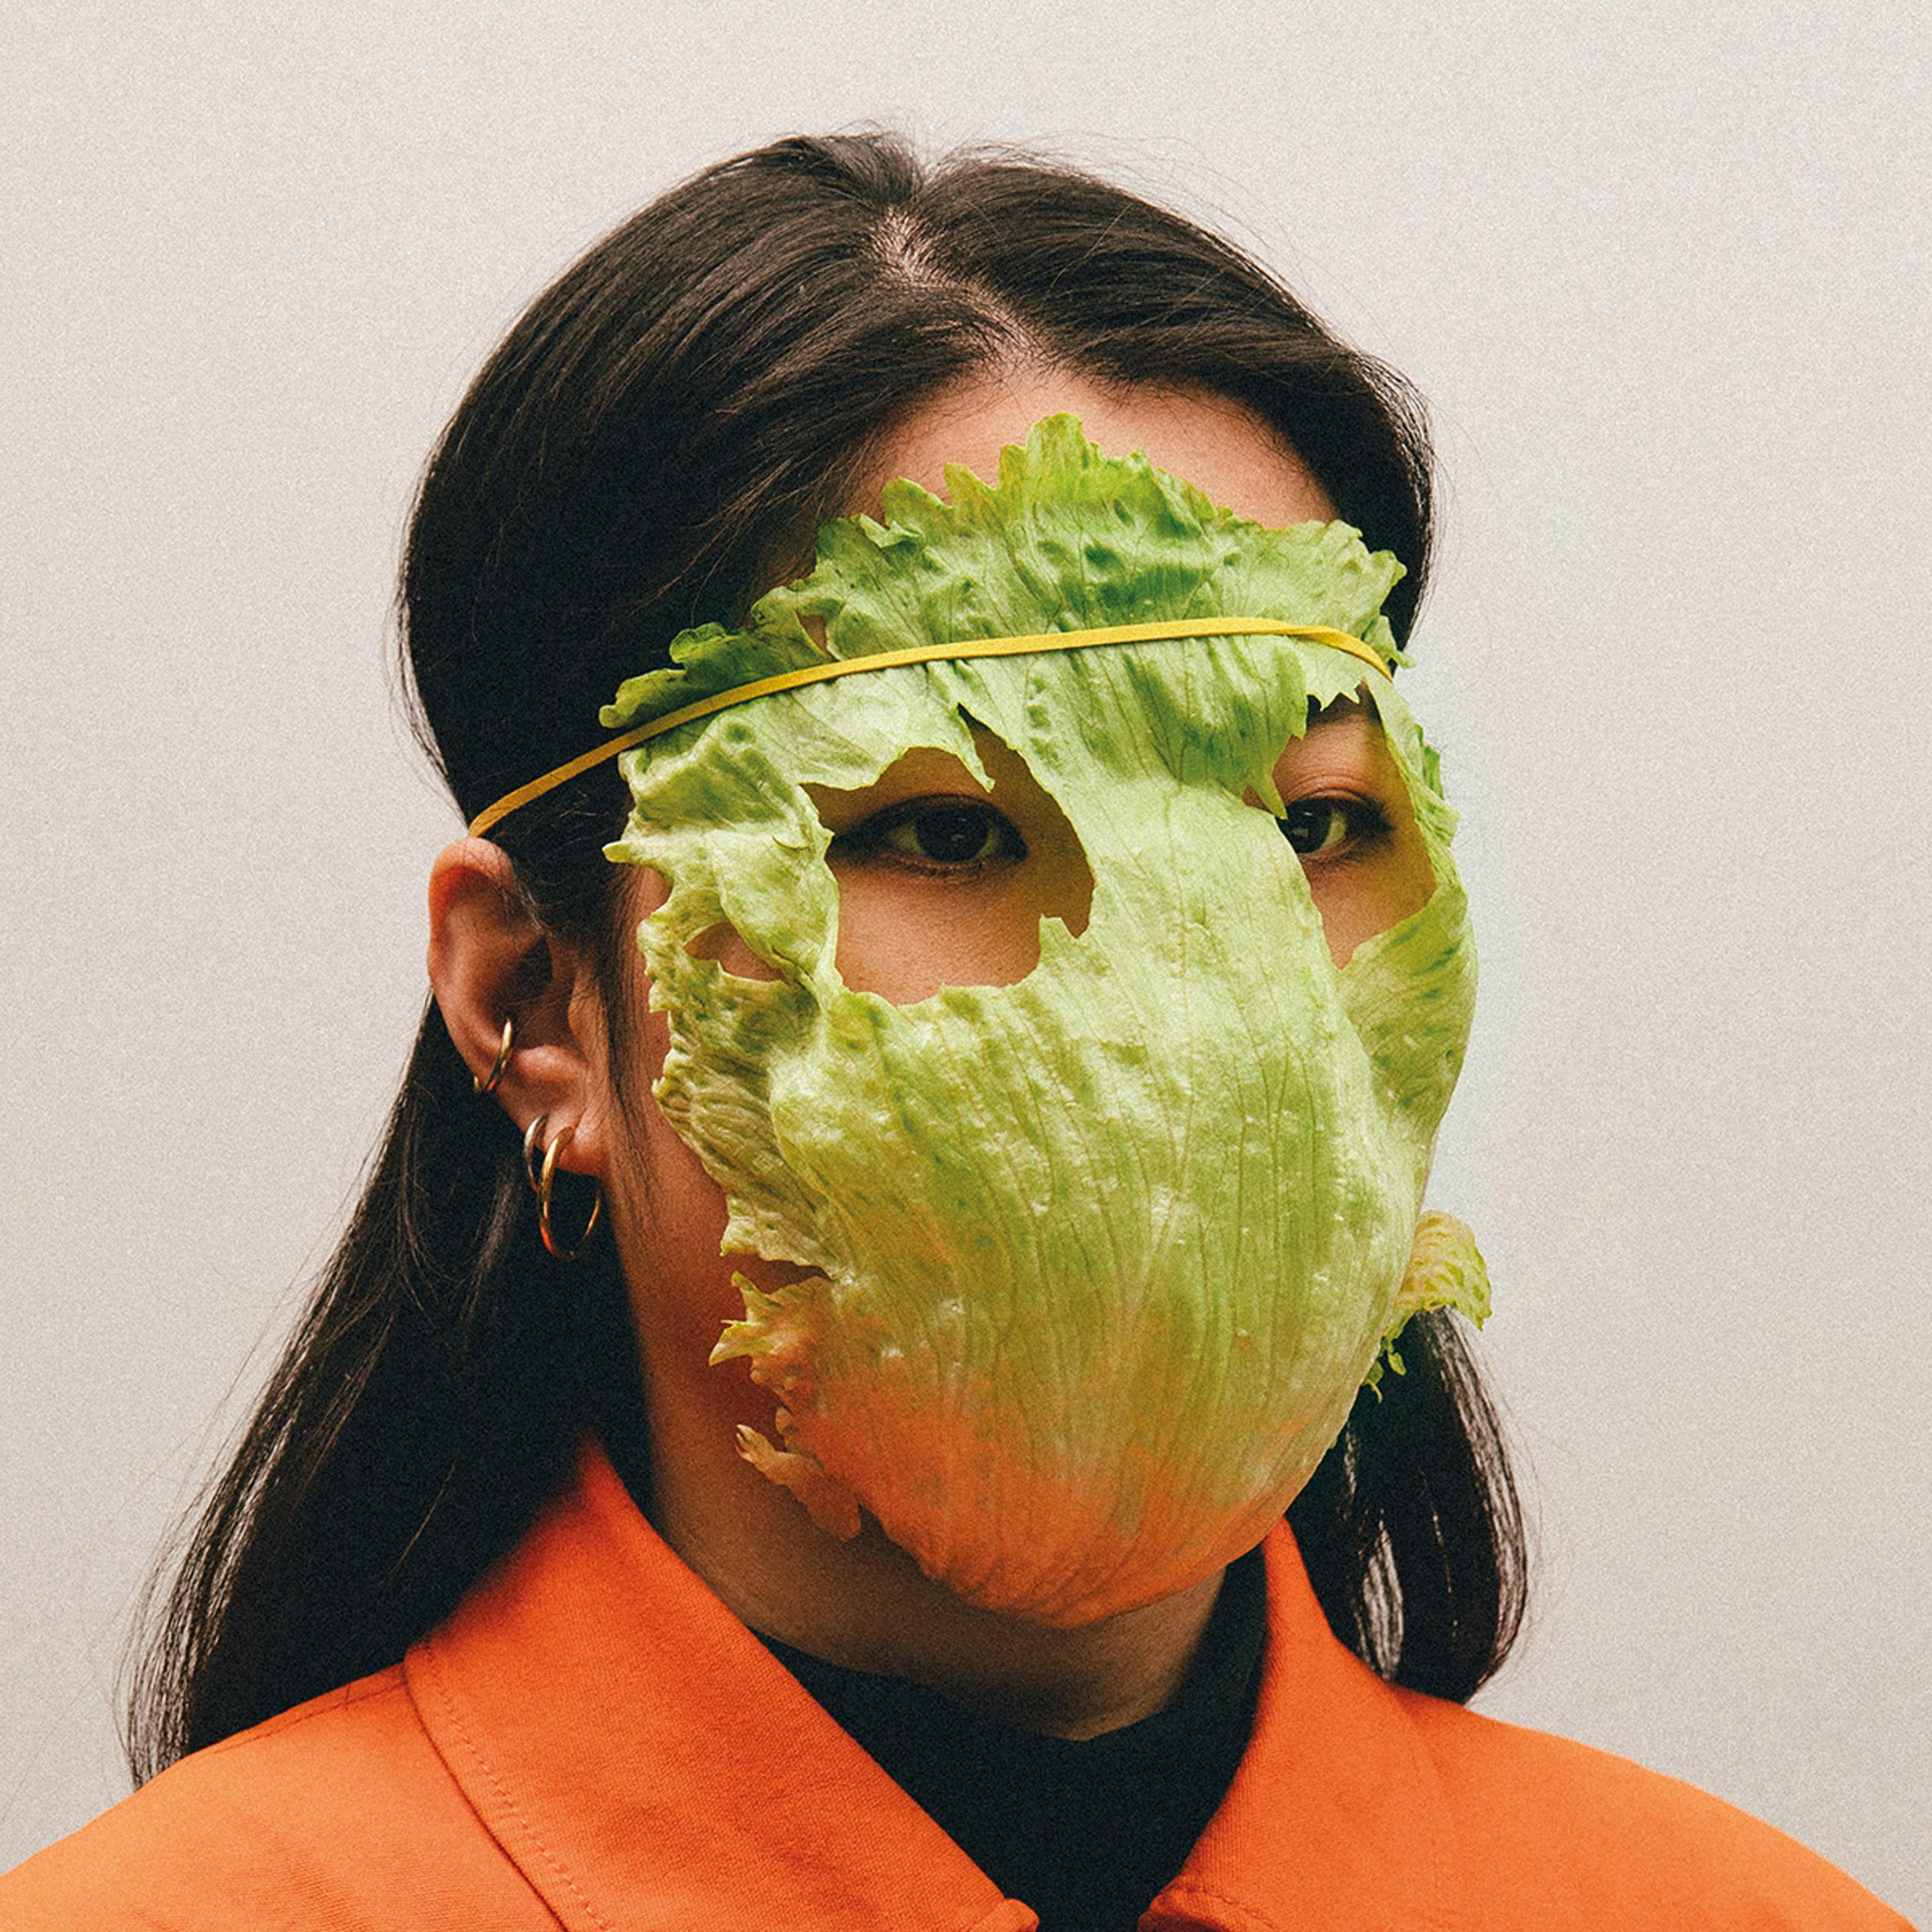 lettuce mask